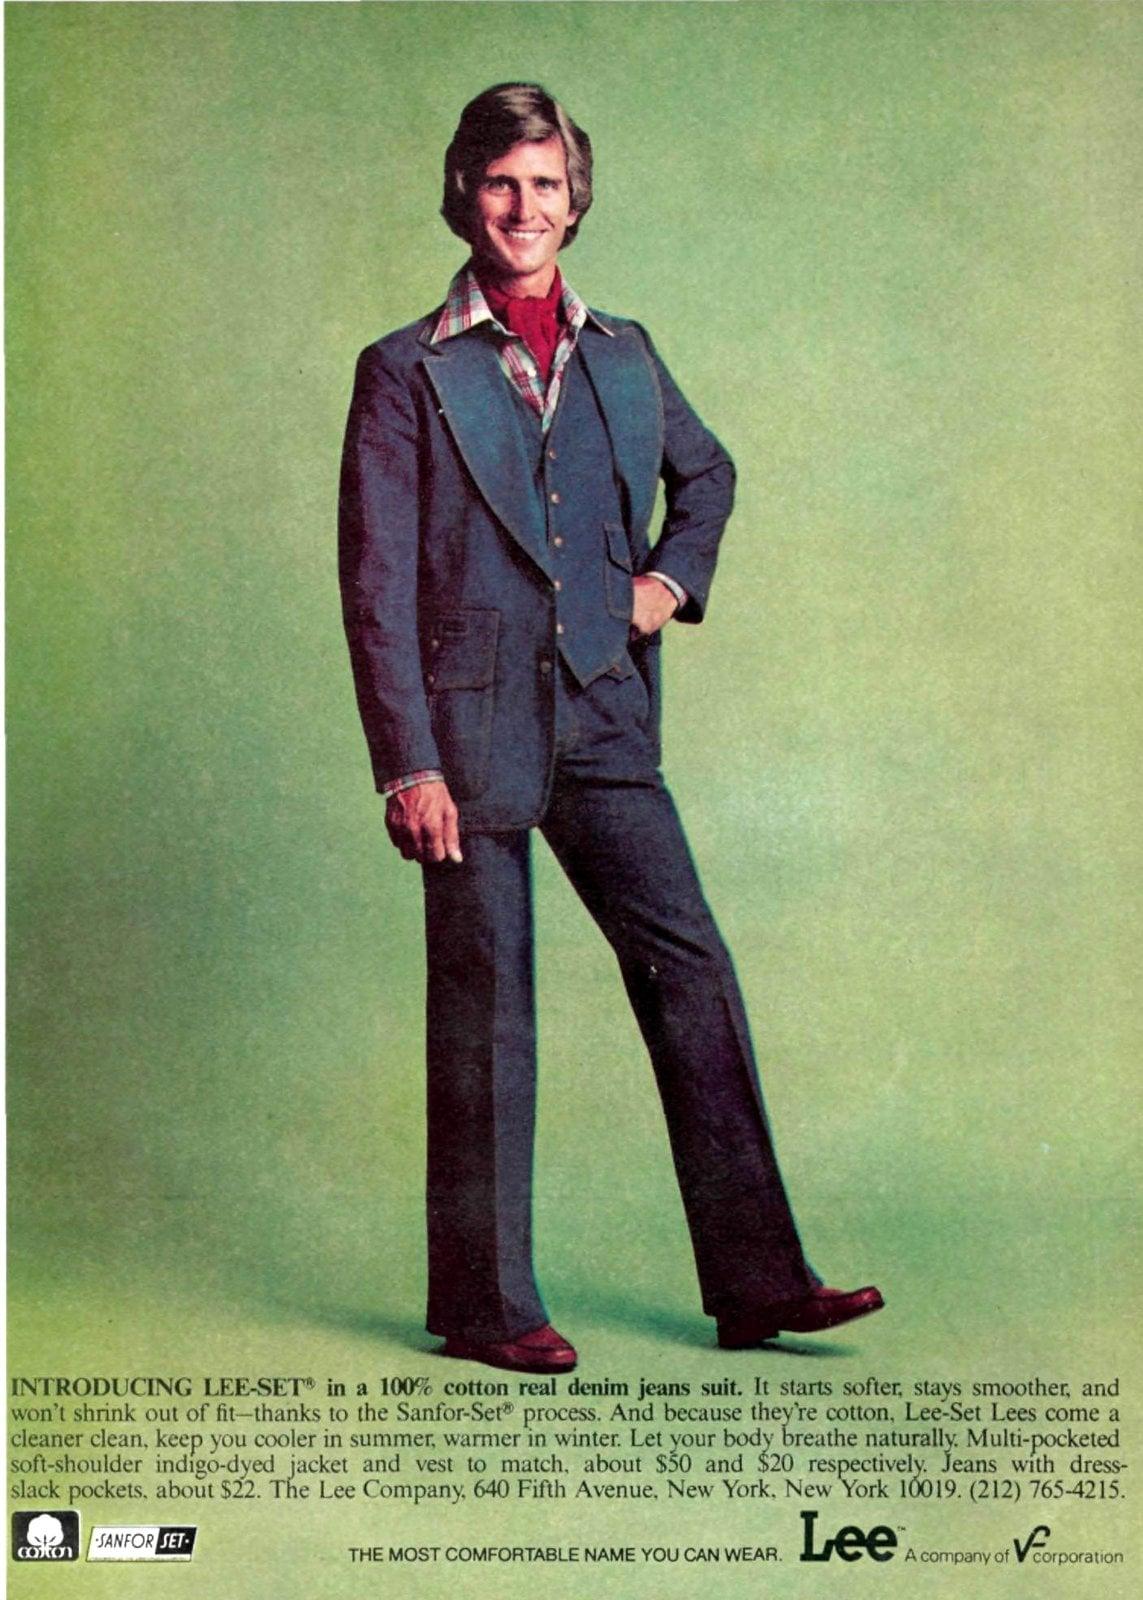 Lee denim suit for men (1976)